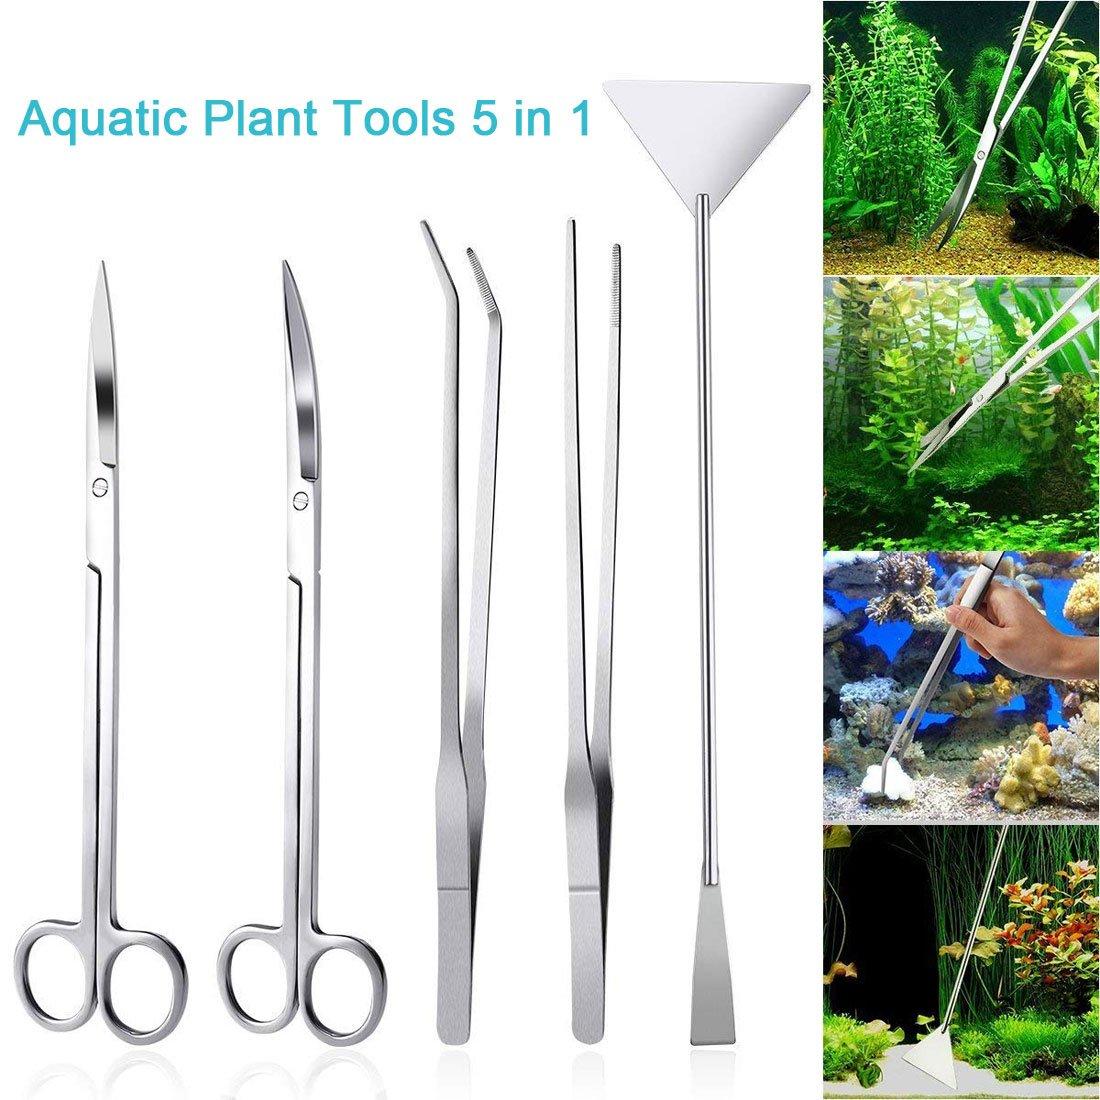 LONDAFISH Fish Tank Stainless Steel Plant Tool Set Aquarium Aquascaping Tweezers Scissors Kit 3 in 1/Substrate Spatula (5 in 1)